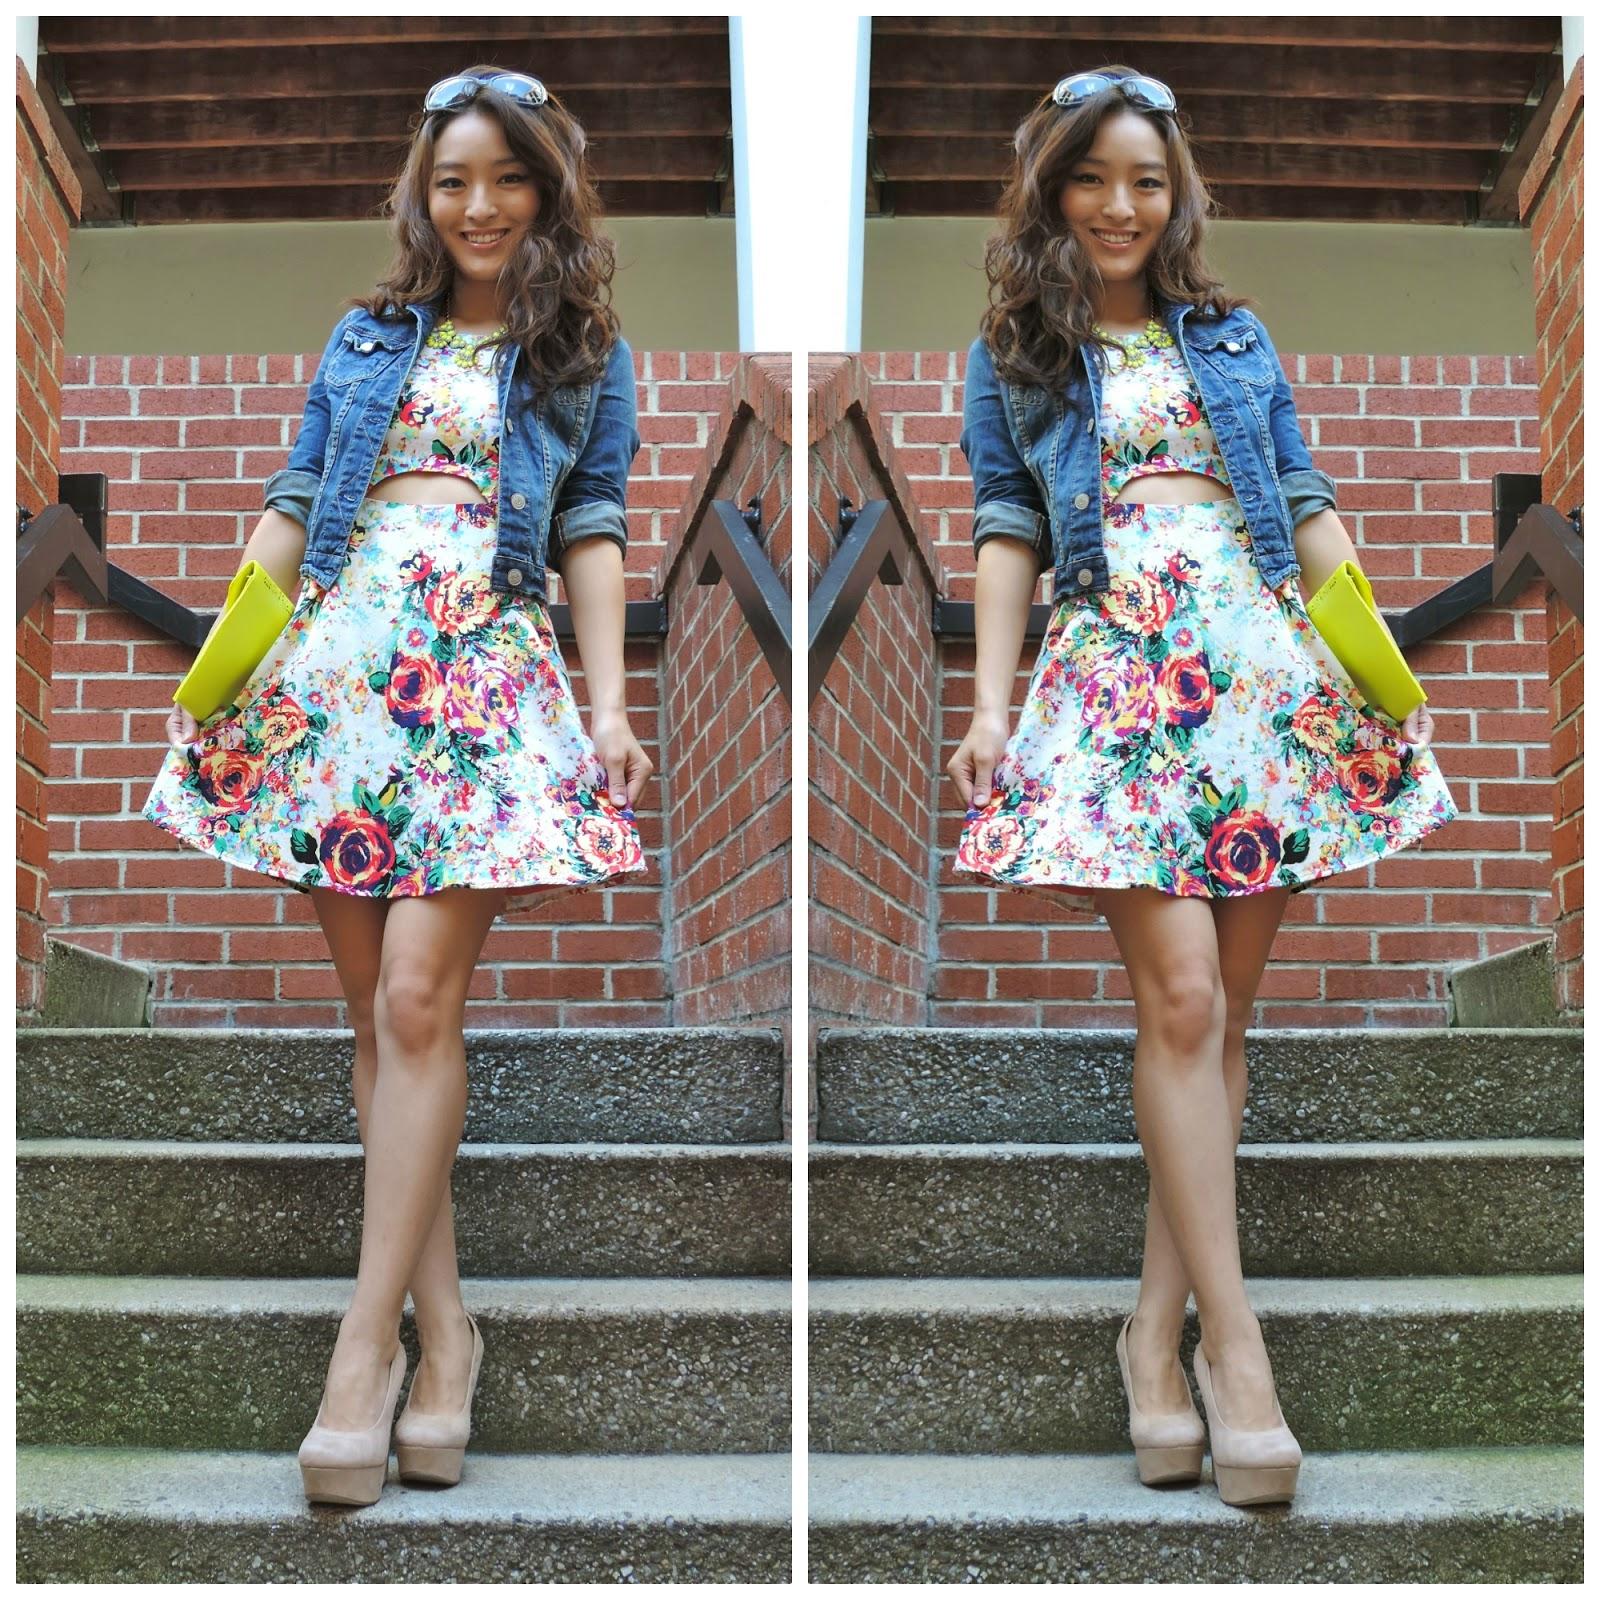 Aeropostale Girls Dresses